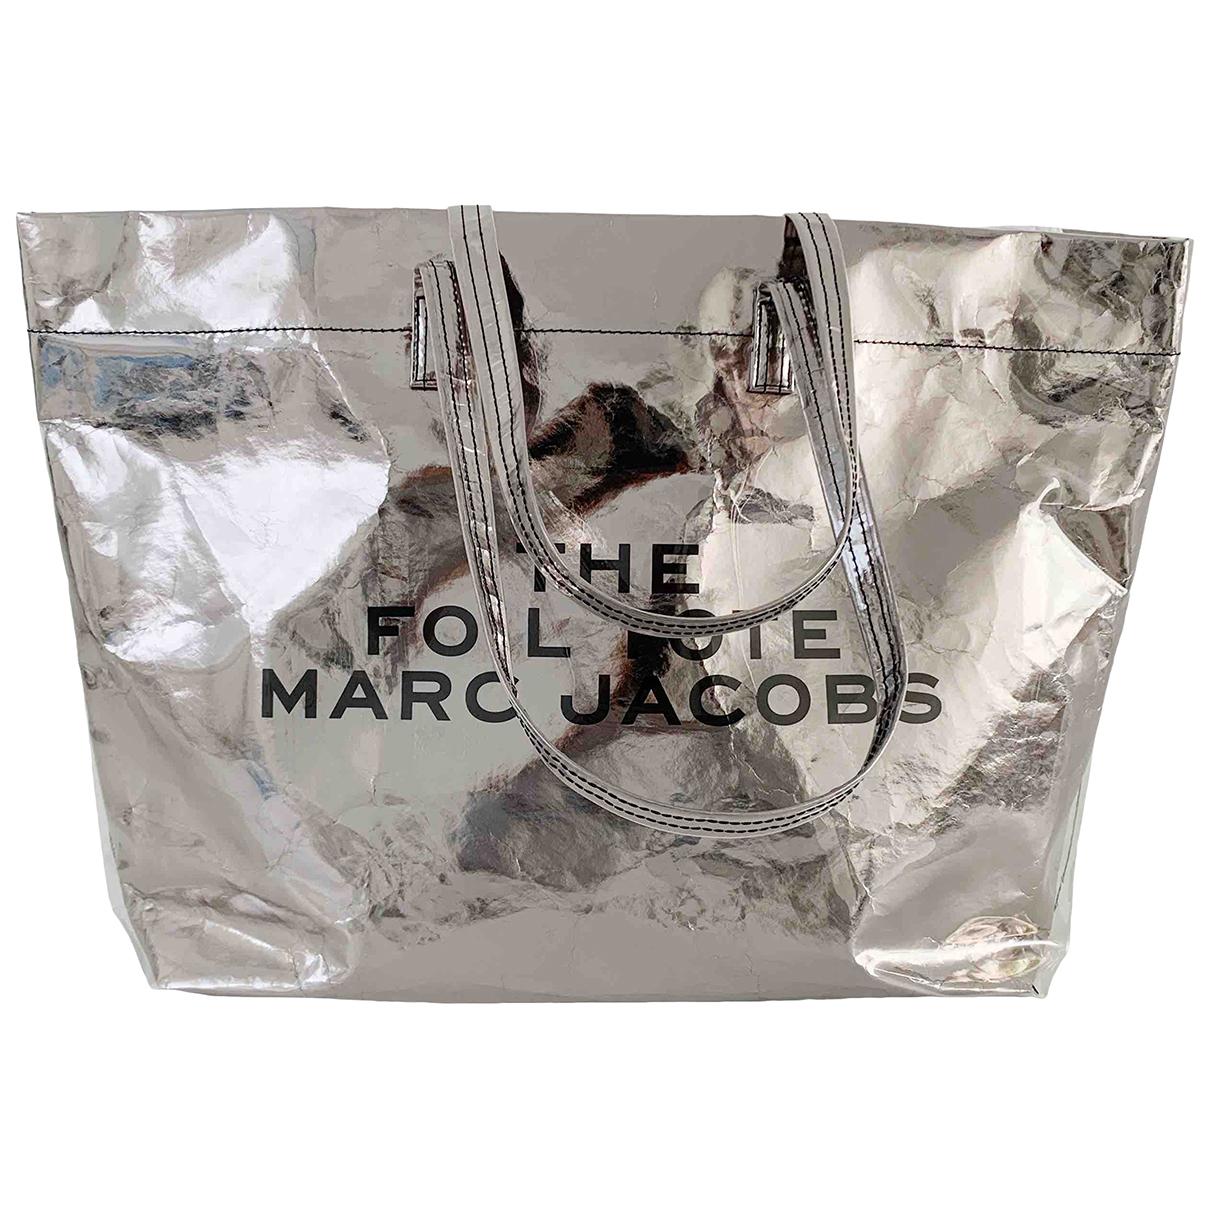 Marc Jacobs \N Silver handbag for Women \N